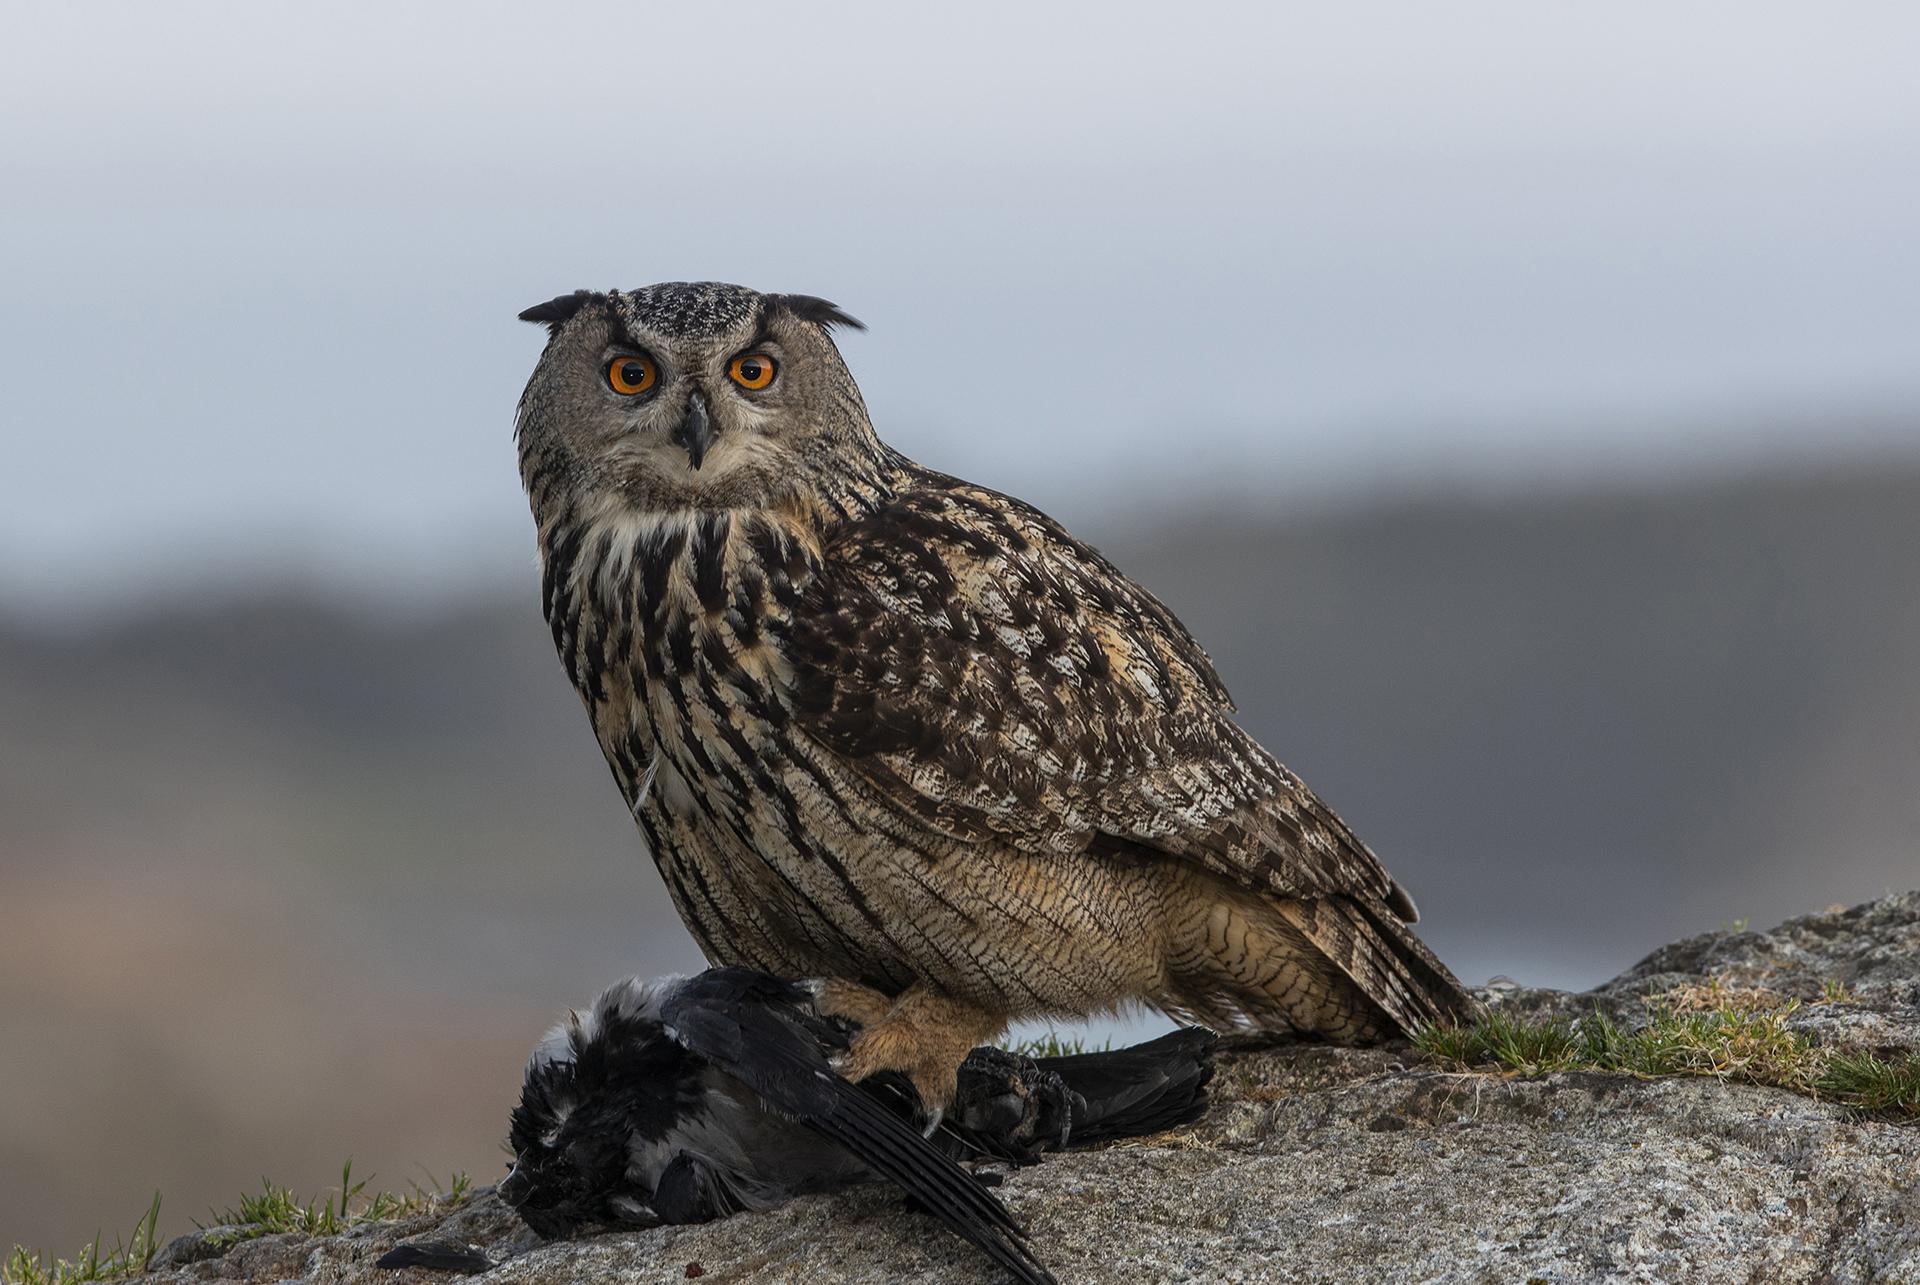 Eagle Owl, Bjørn Dykesteen